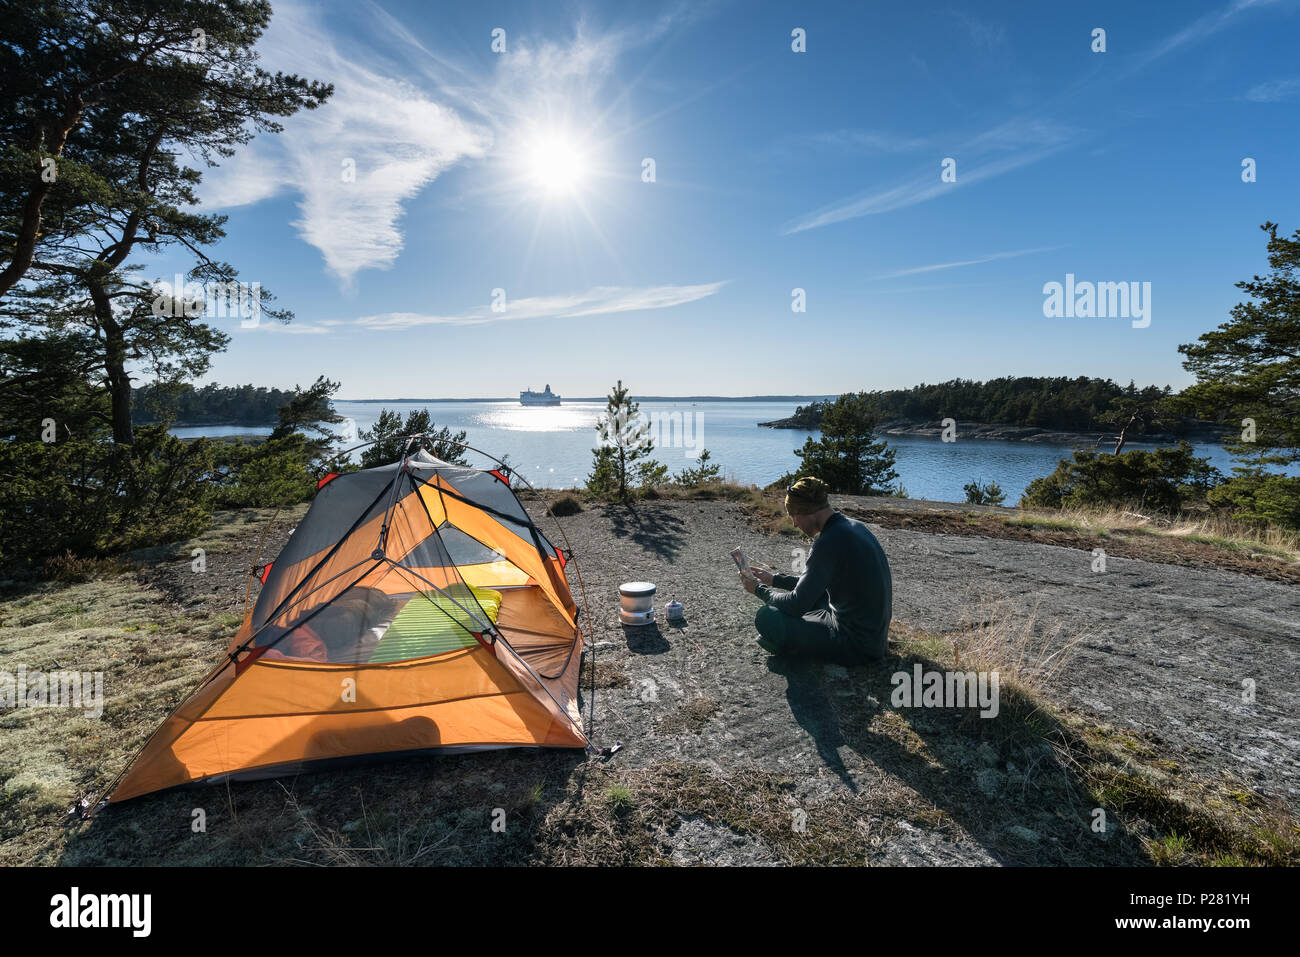 At Bylandet island, Kirkkonummi, Finland, Europe, EU - Stock Image